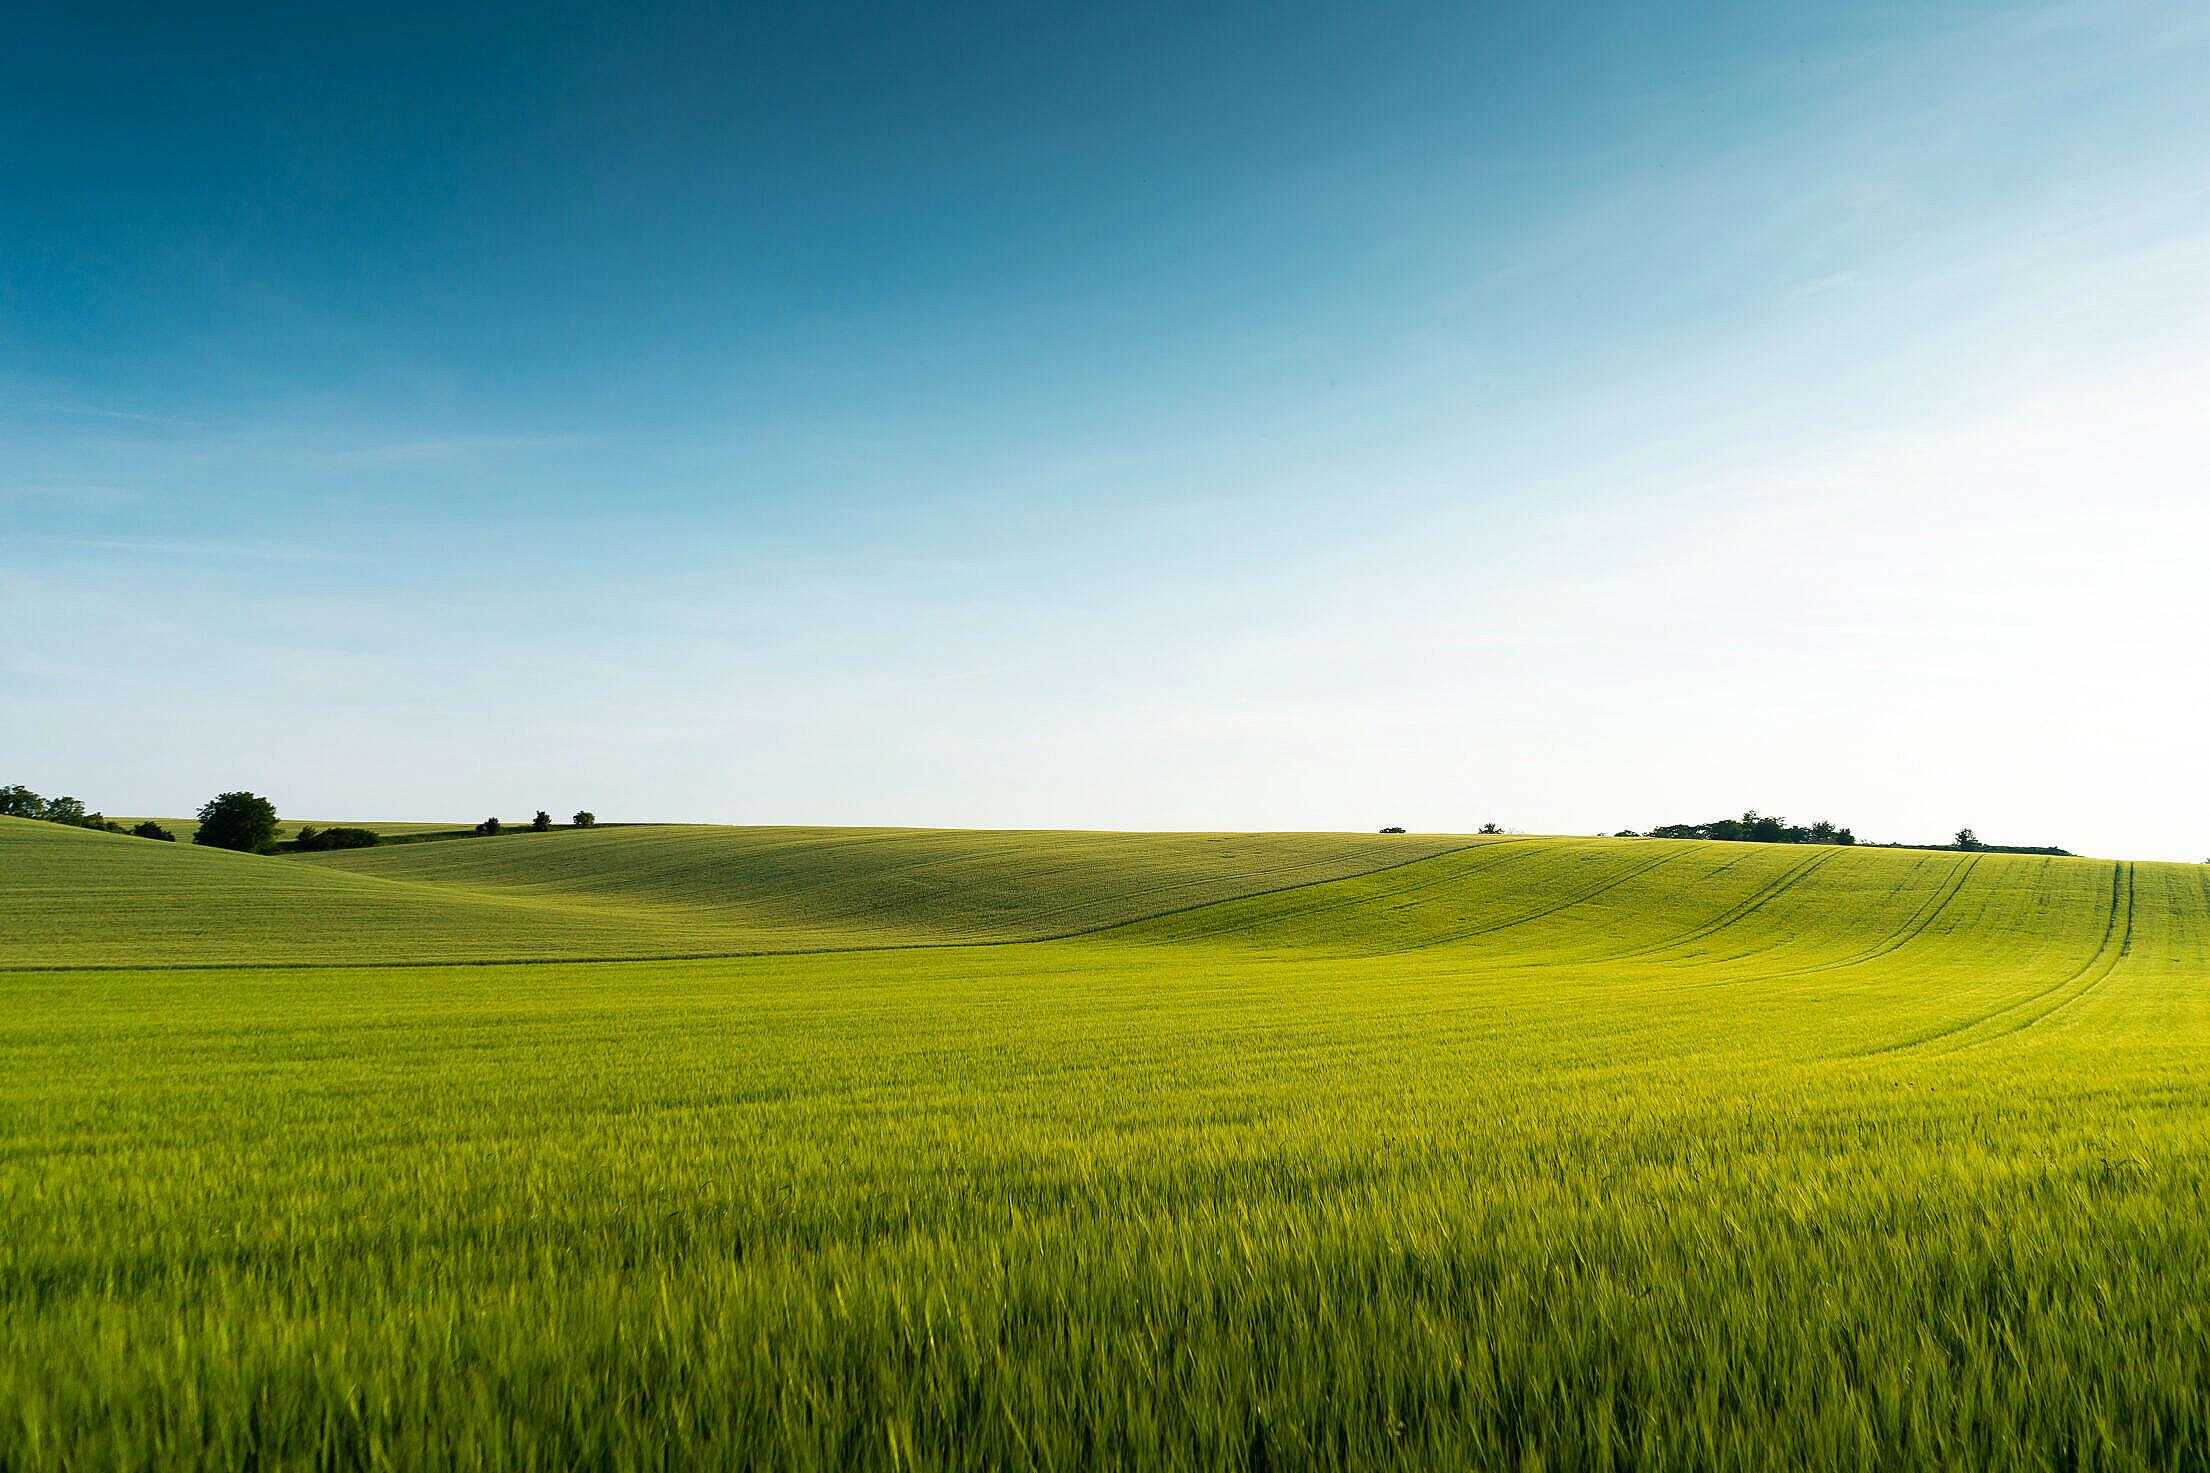 Beautiful Green Field Scenery Free Stock Photo